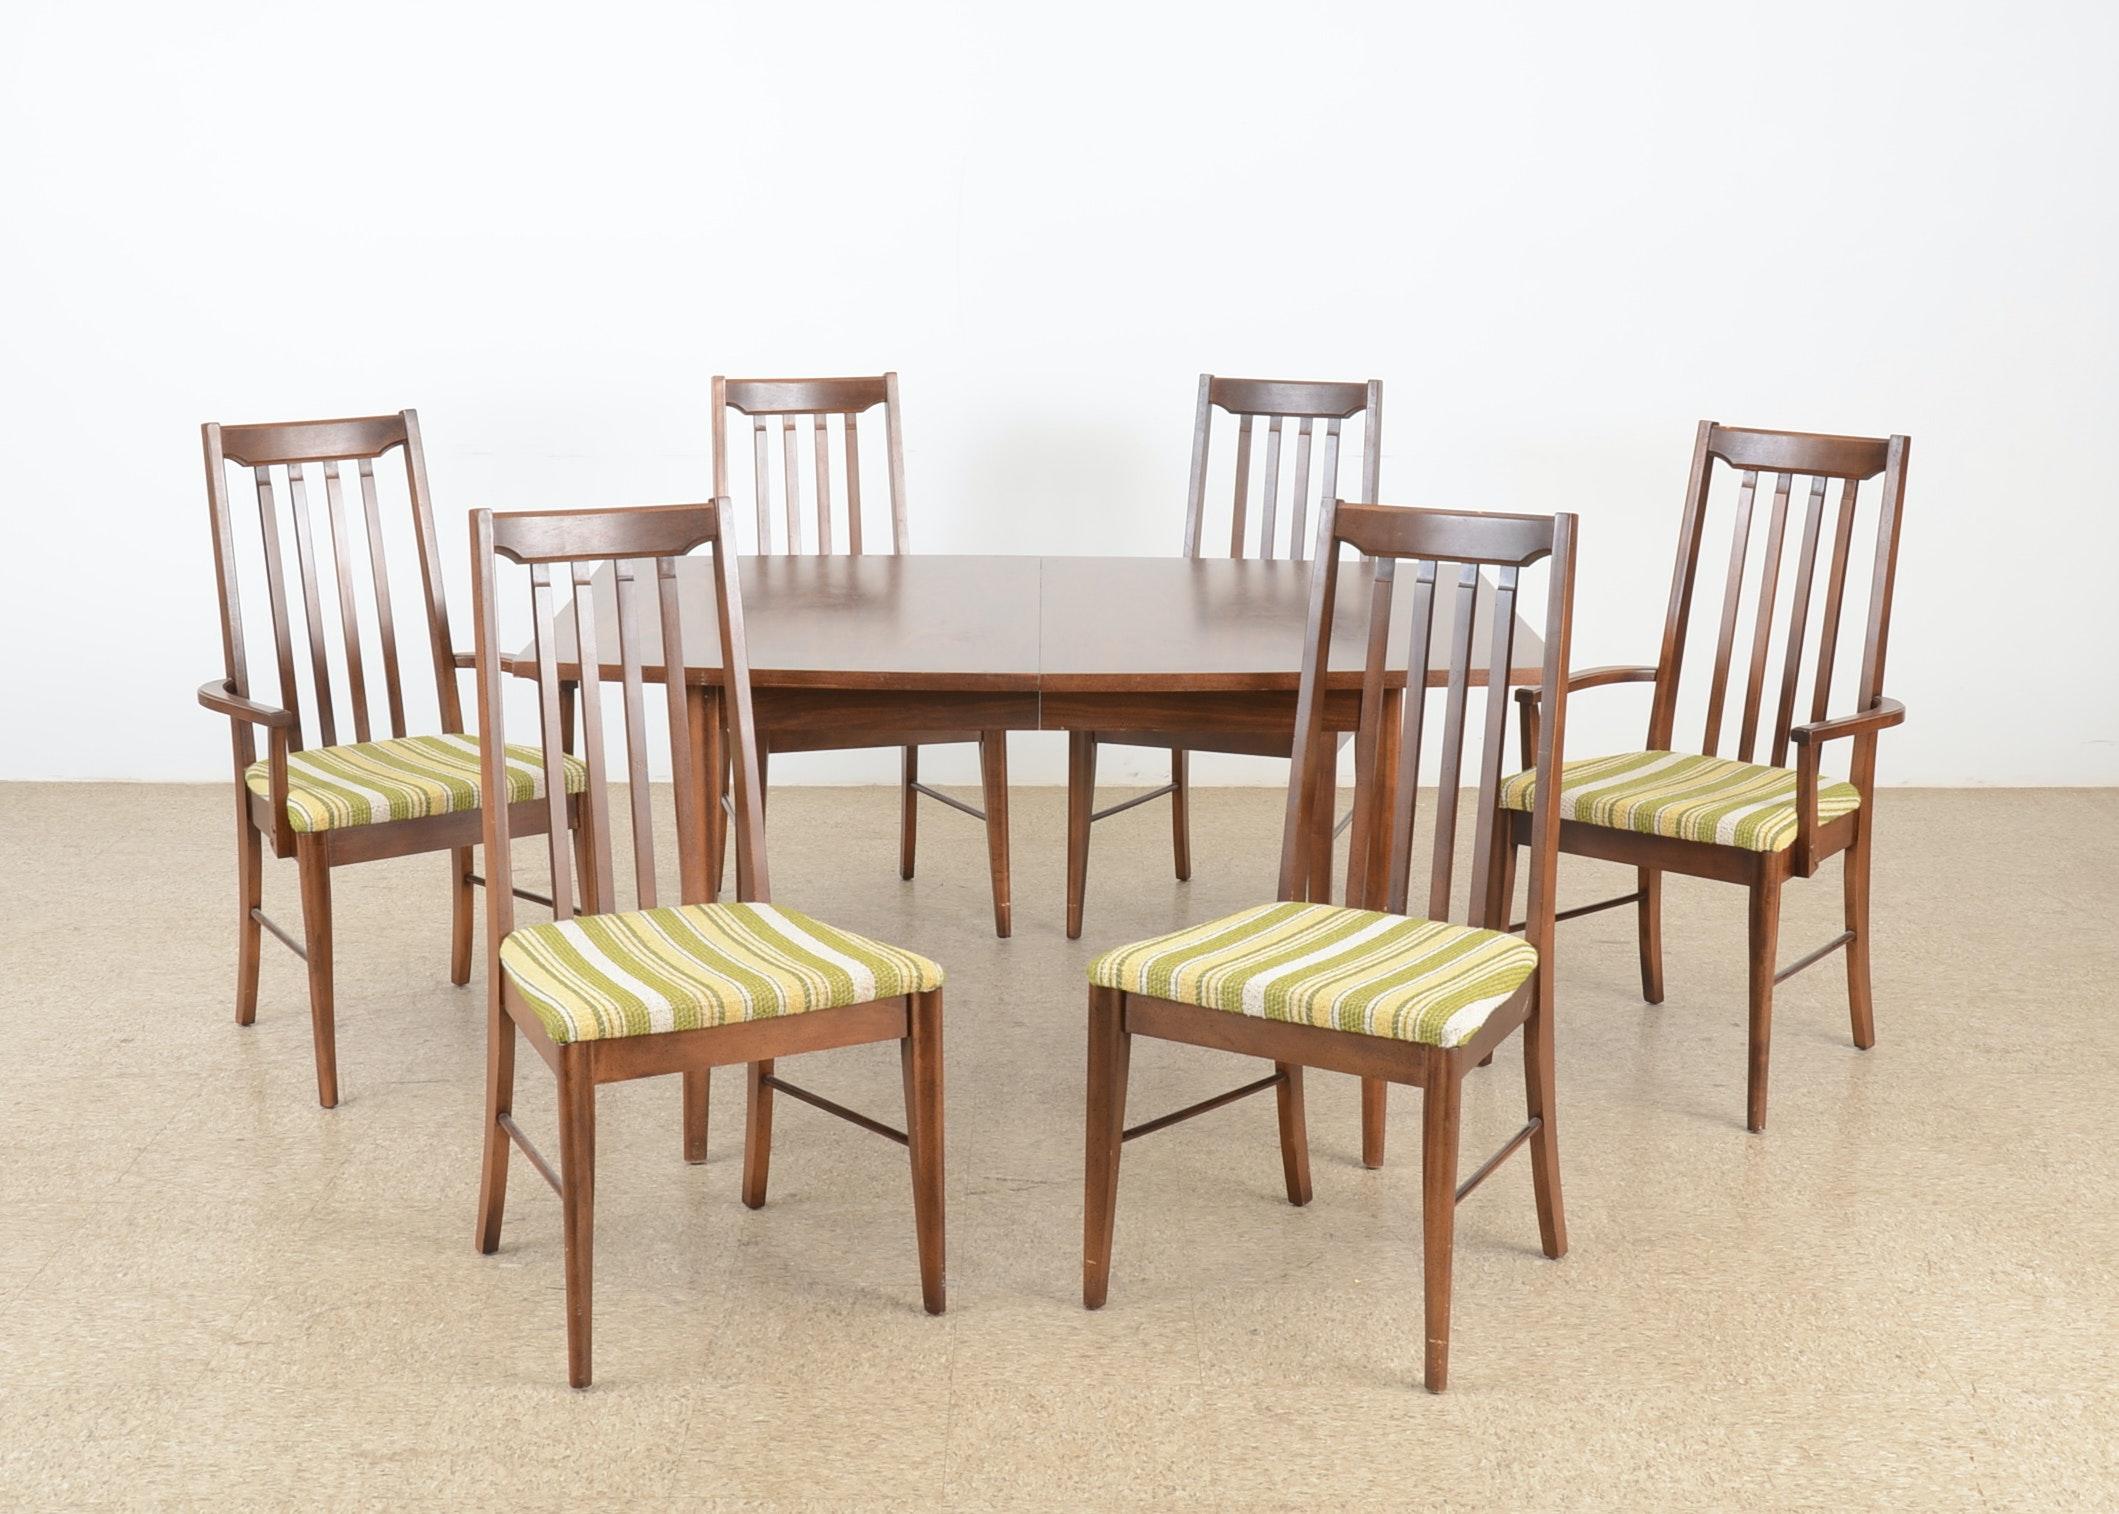 Broyhill Furniture Dining Room Set, Circa 1950s ...